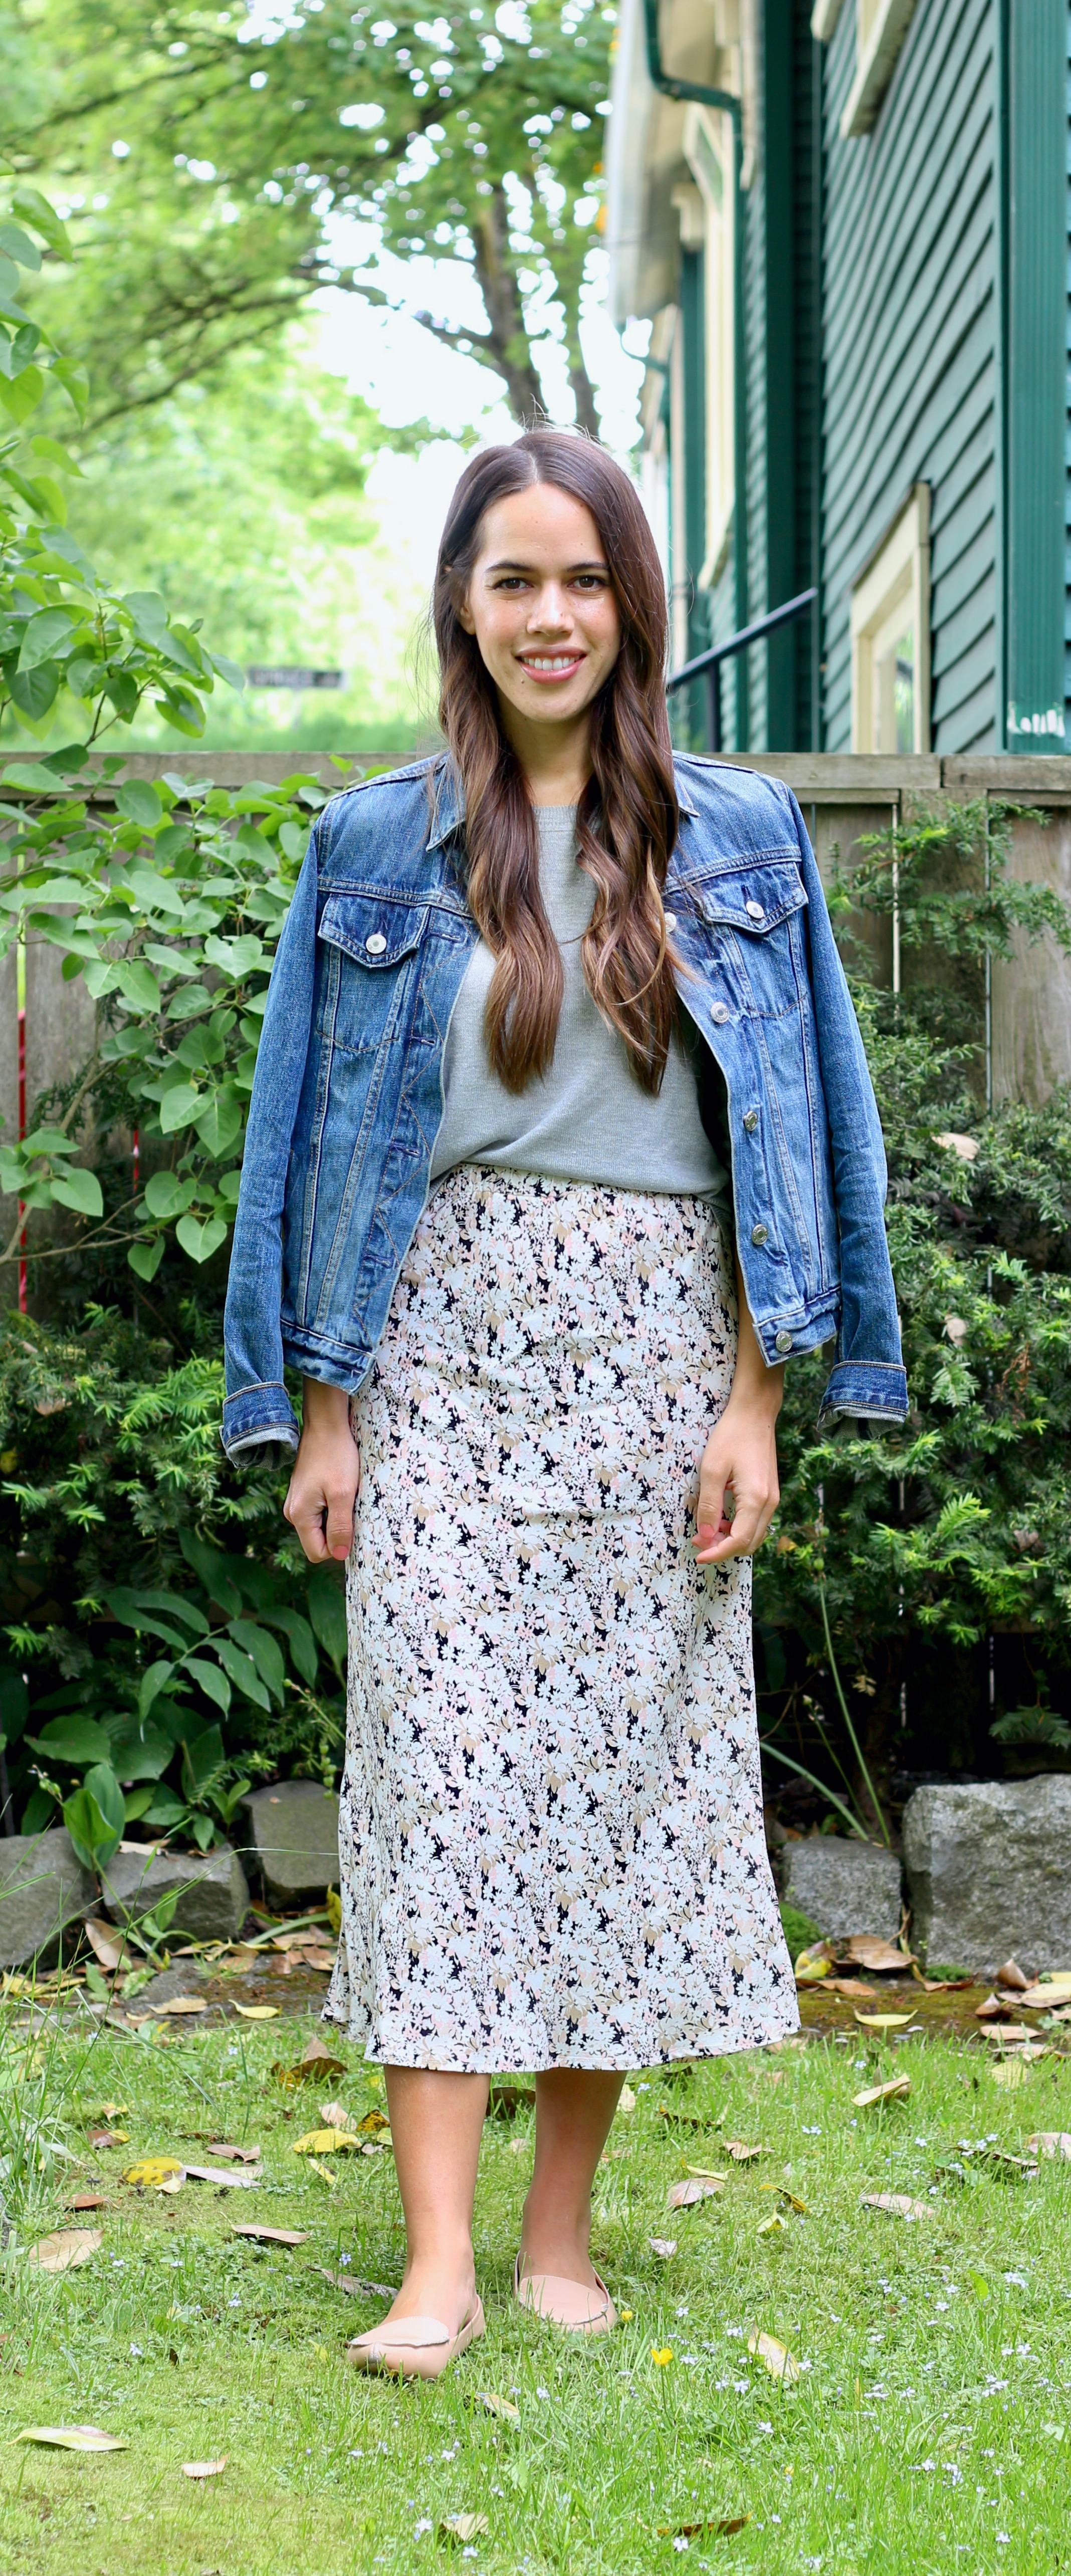 Jules in Flats - Floral Slip Midi Skirt with Grey Crop Sweater & Denim Jacket